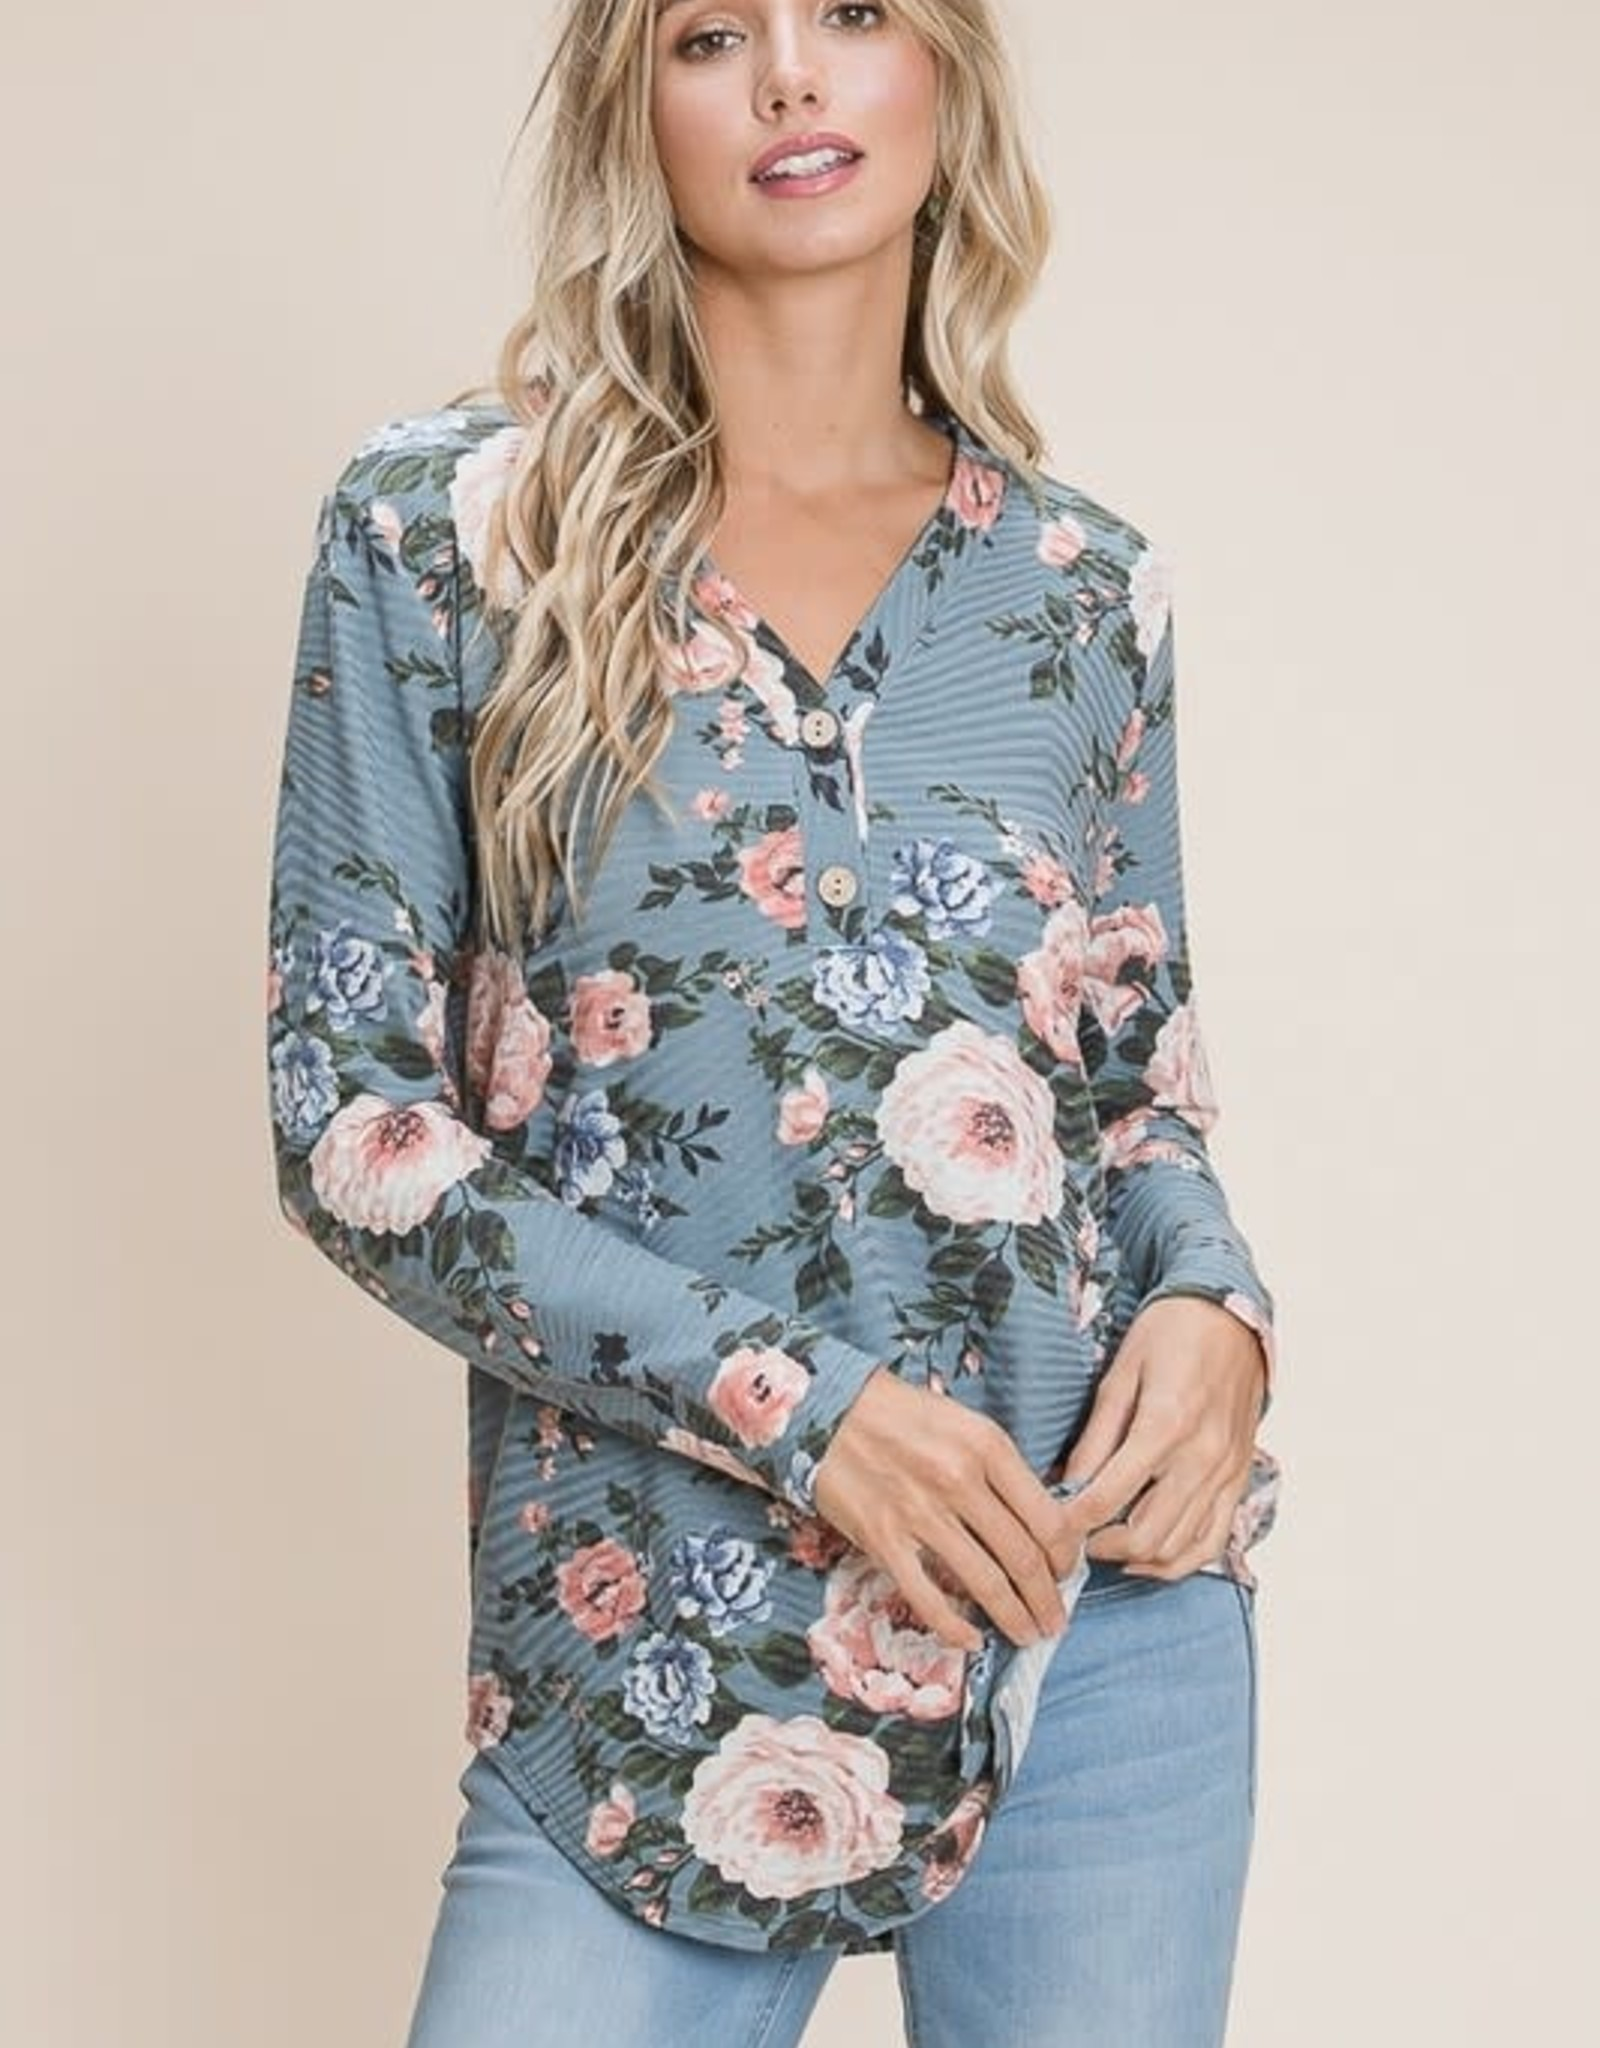 Miss Bliss Floral Print LS Top- Denim